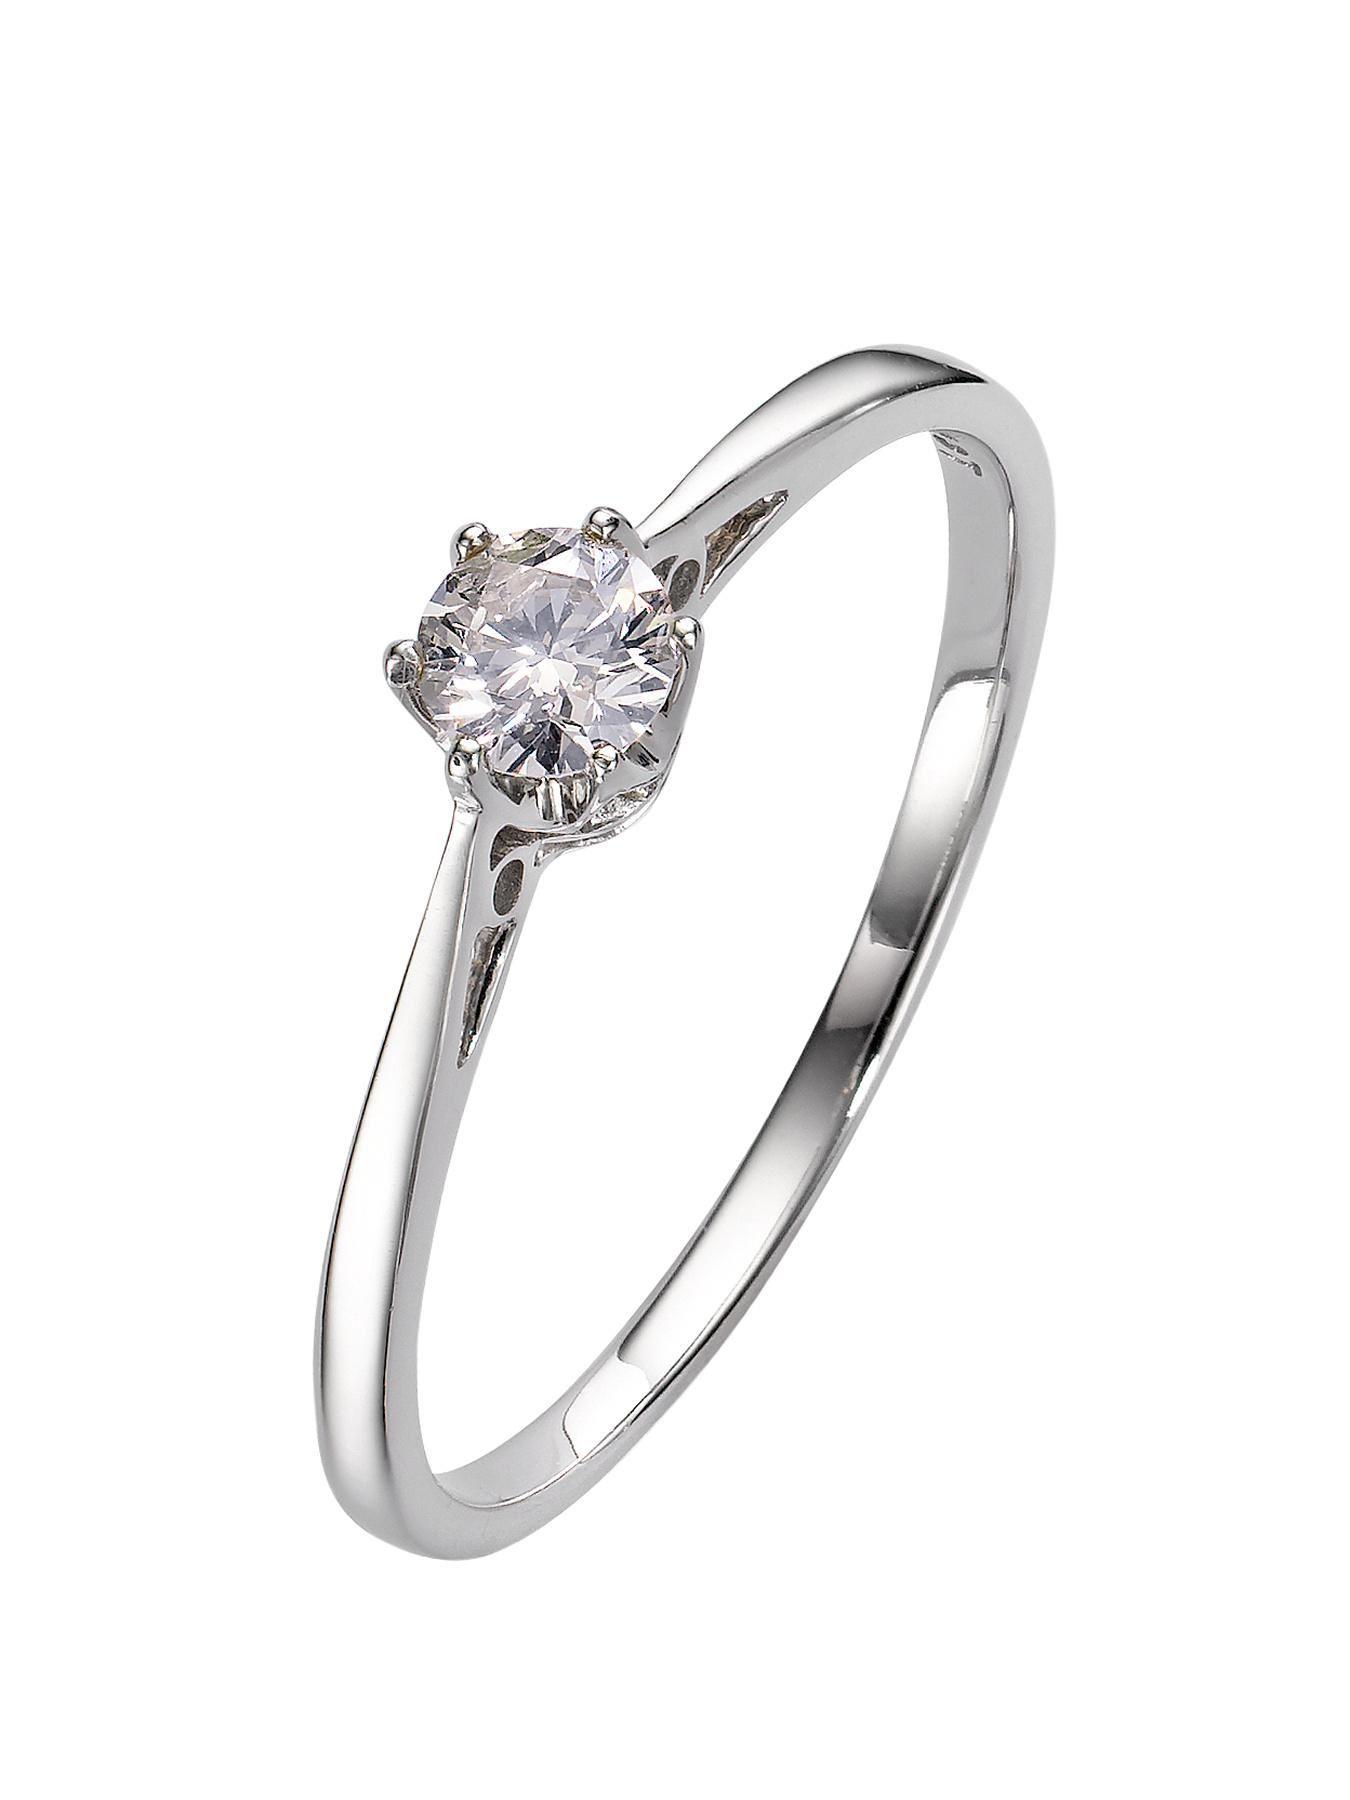 platin diamant engagement solitaire ring 6 klaue brilliant cut 1 5 karat h si2 ebay. Black Bedroom Furniture Sets. Home Design Ideas